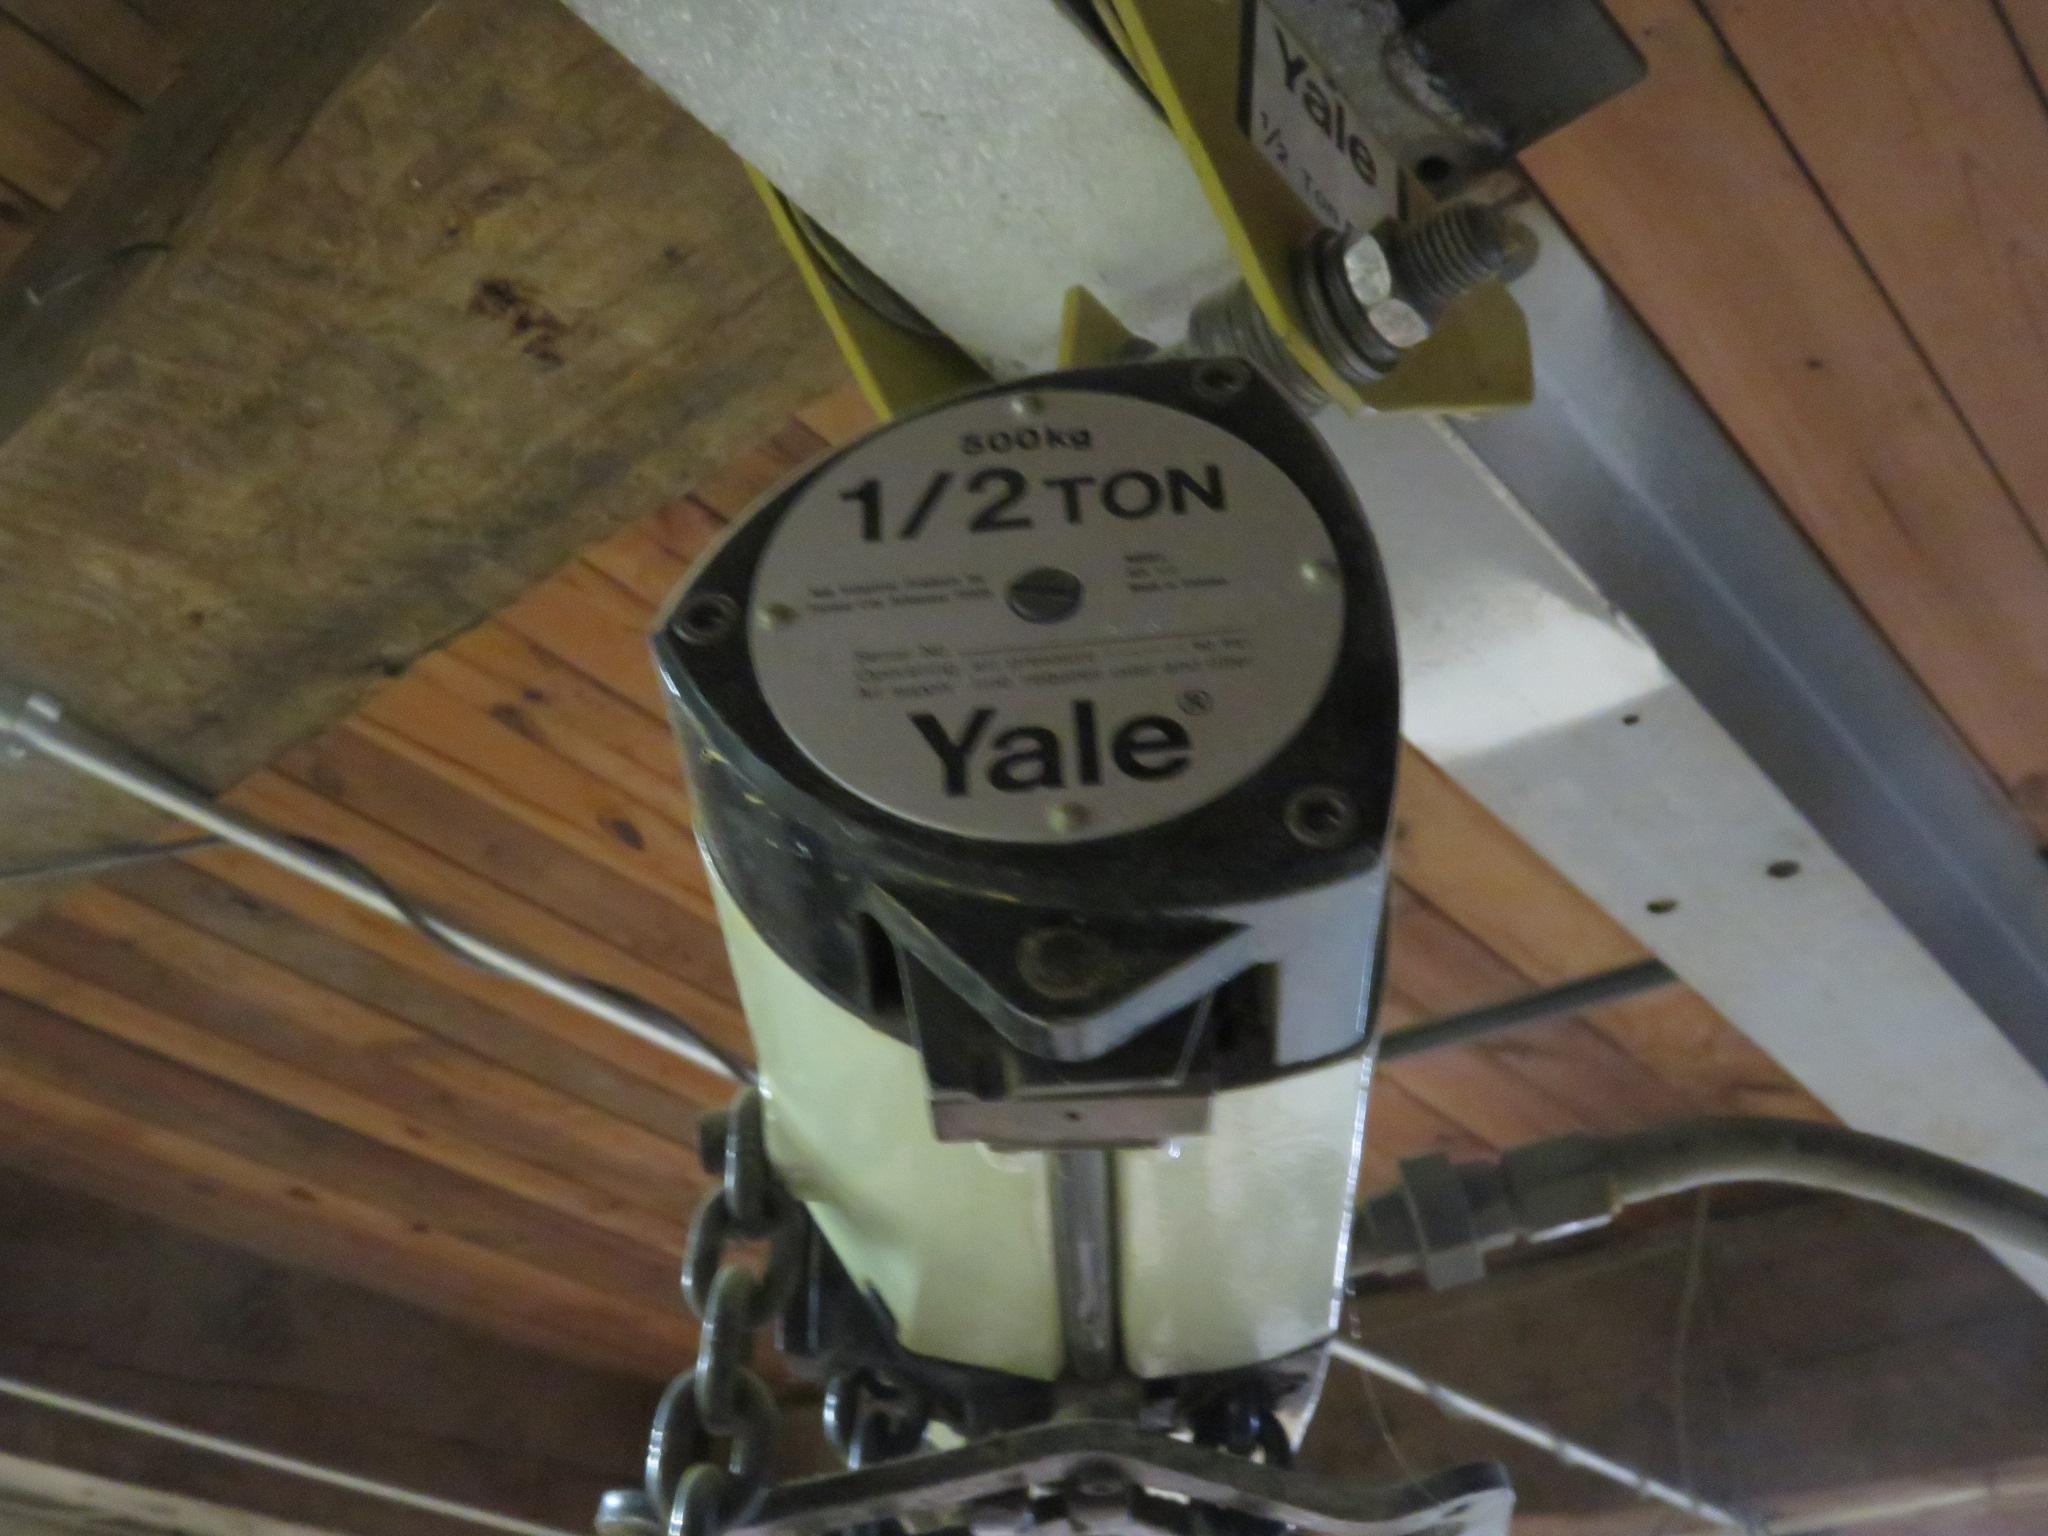 Yale 1/2 Ton Hoist and Trolley